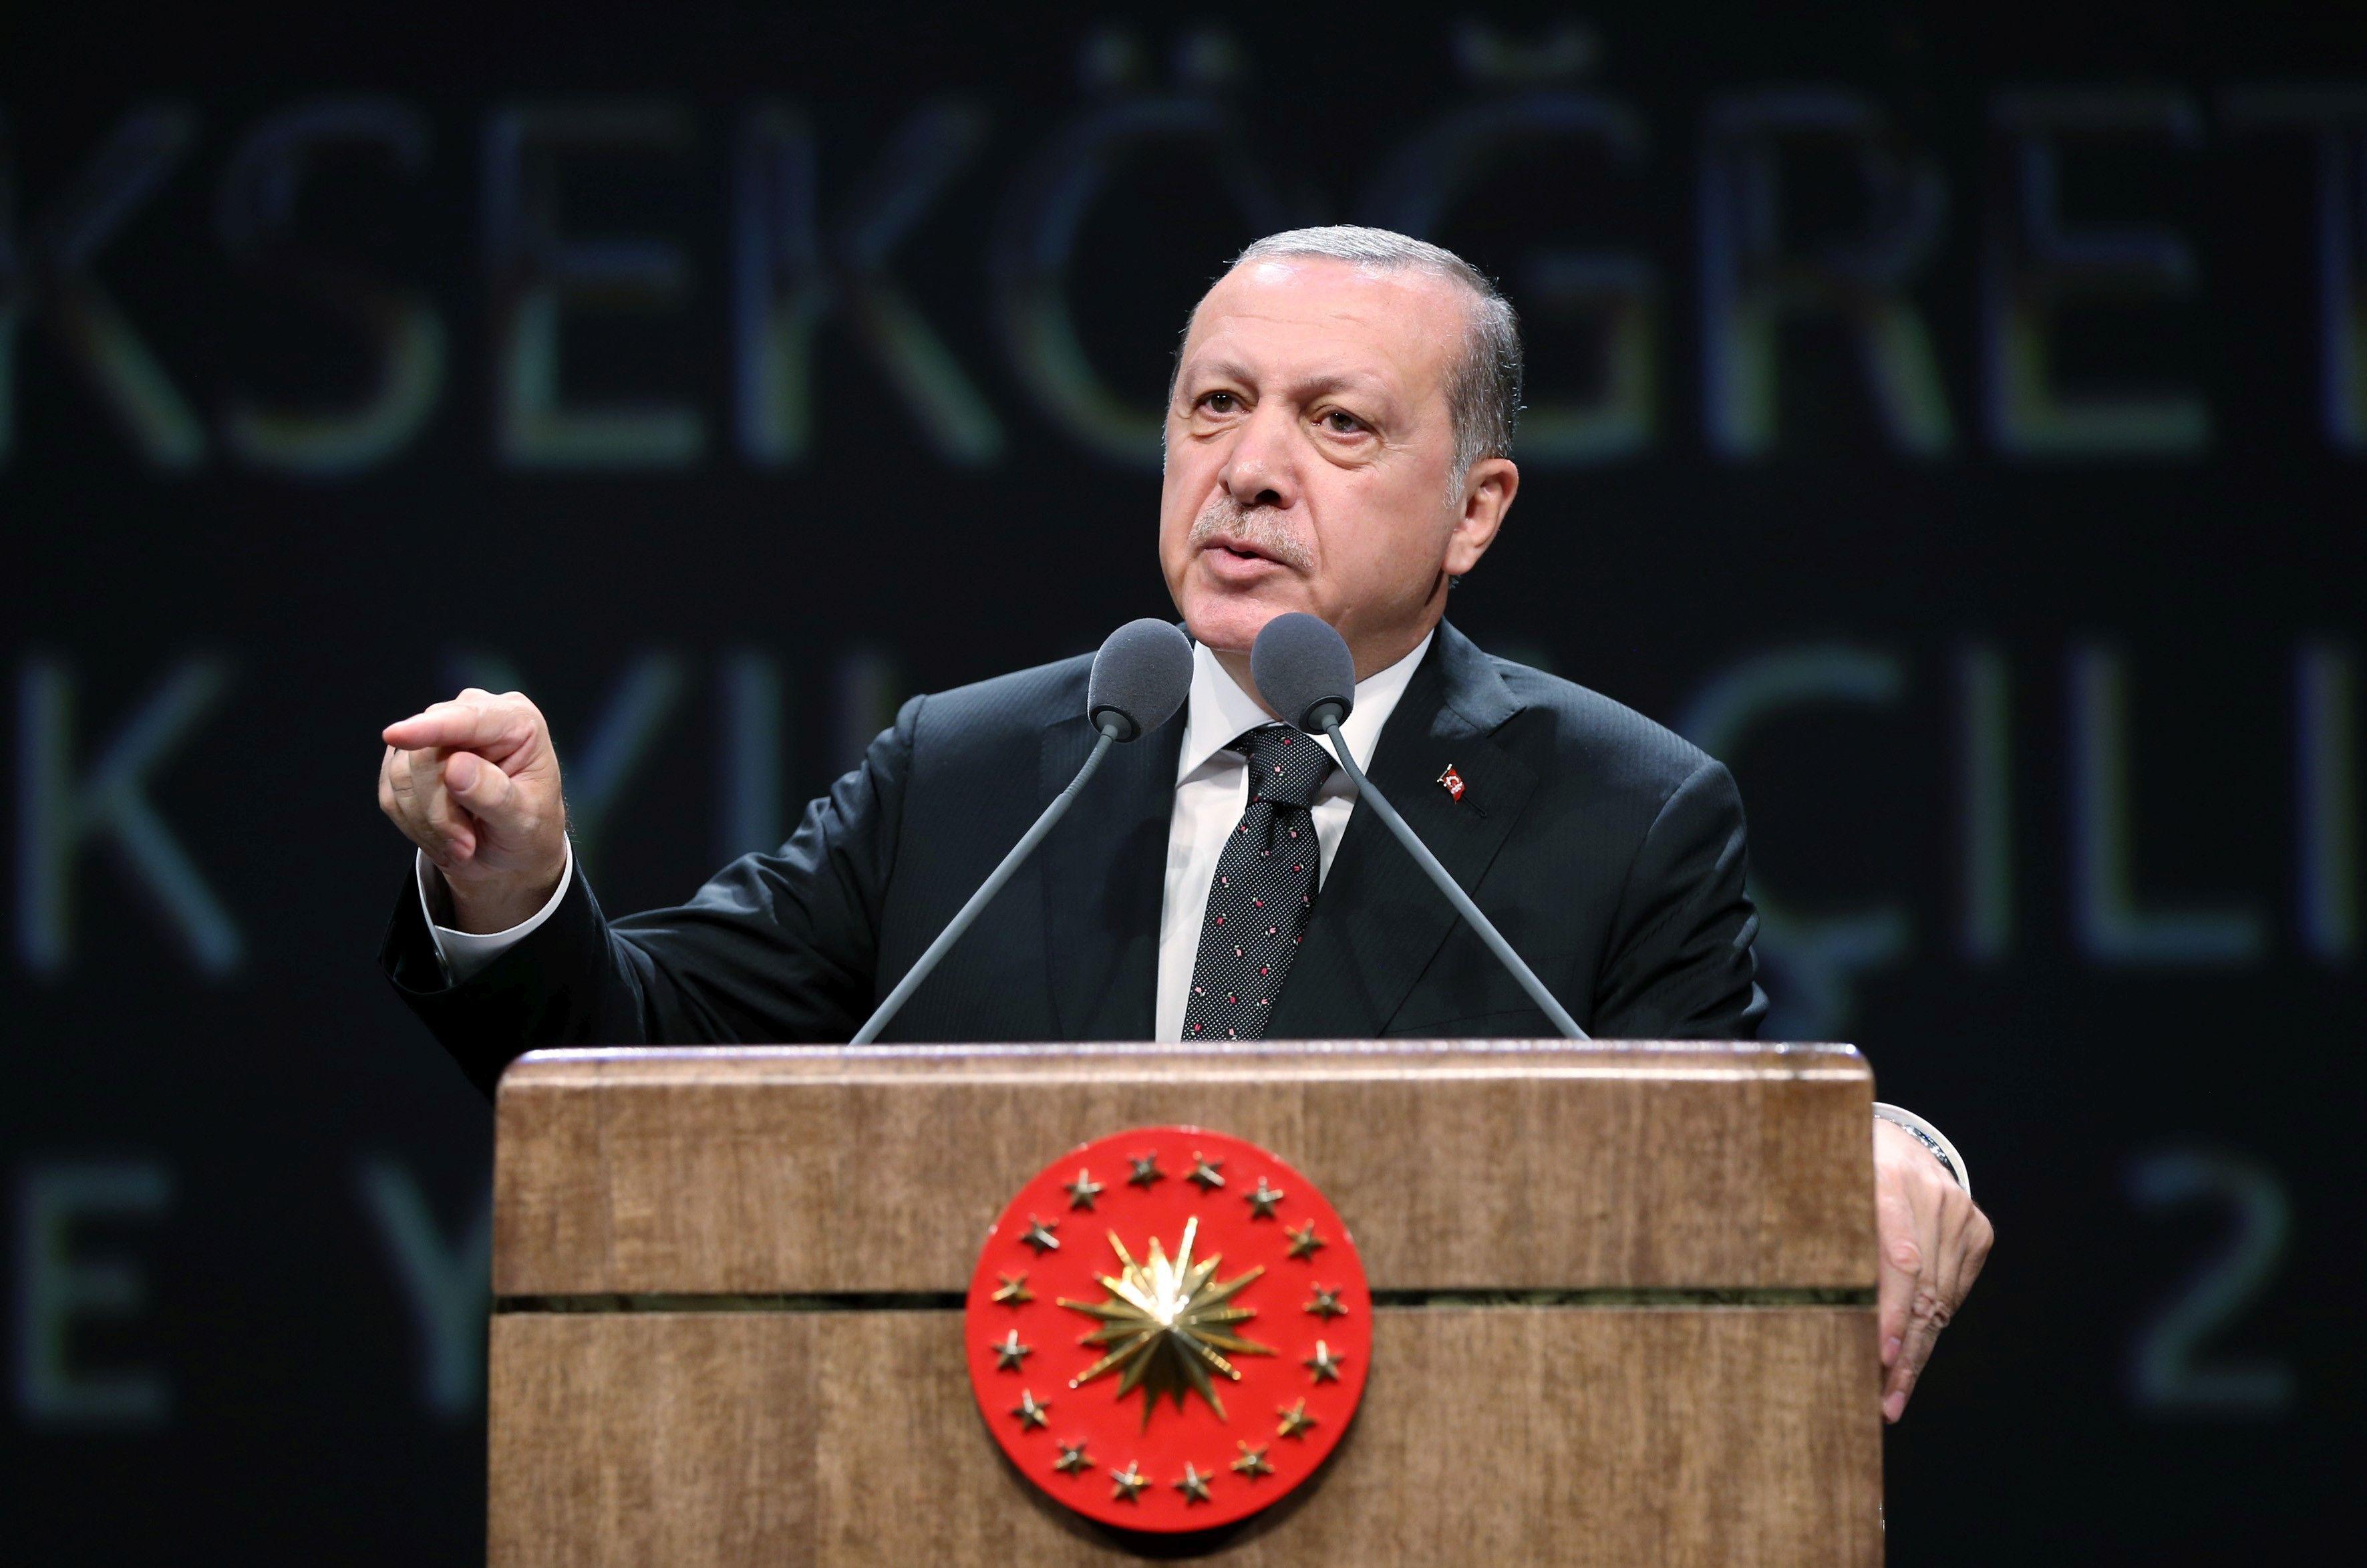 Liderul turc Recep Erdogan l-a catalogat drept terorist pe preşedintele sirian Bashar al-Assad